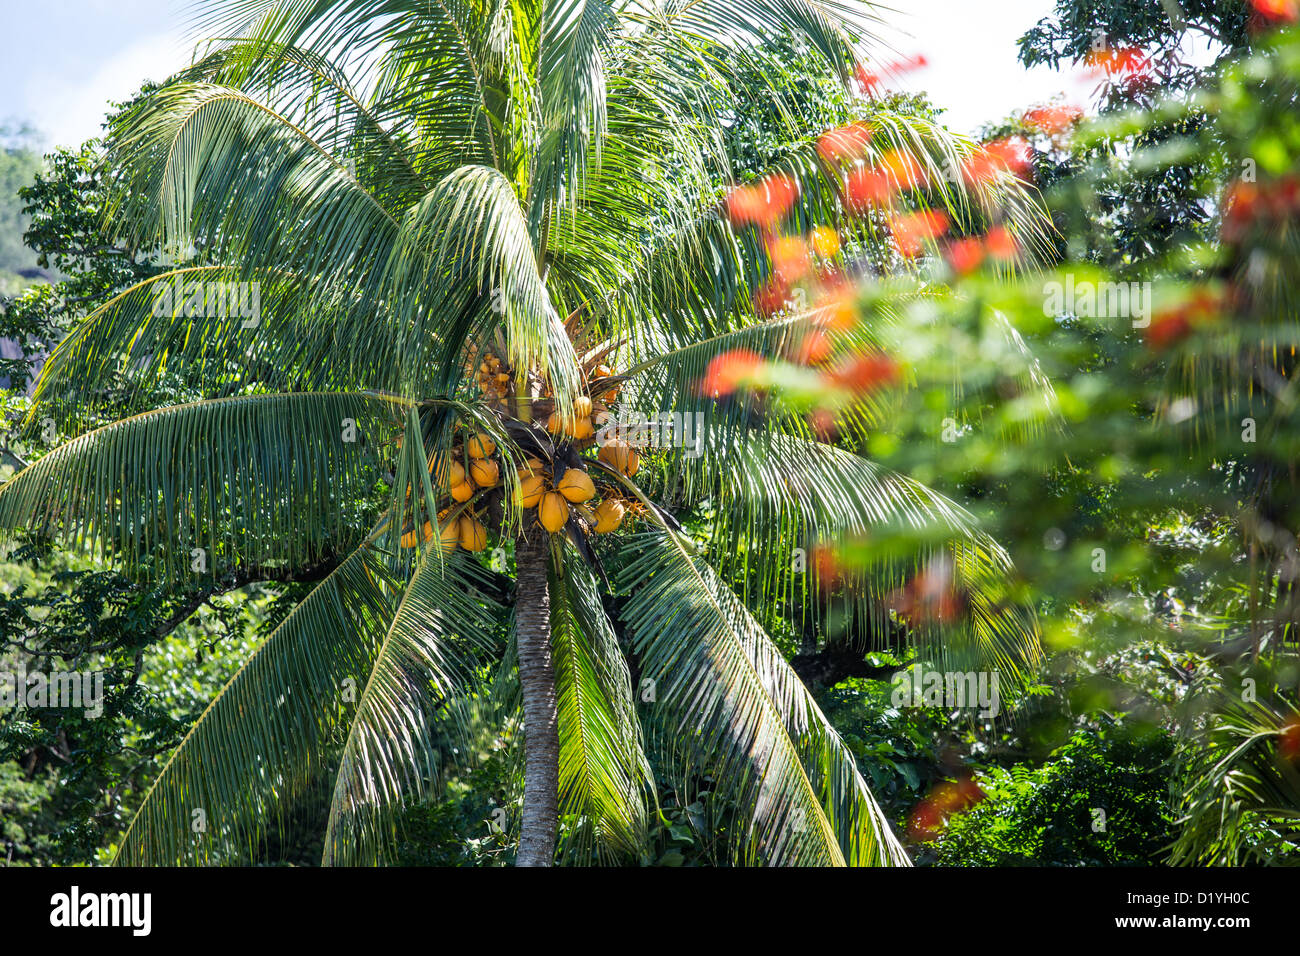 Mahe Island, Seychelles - Stock Image